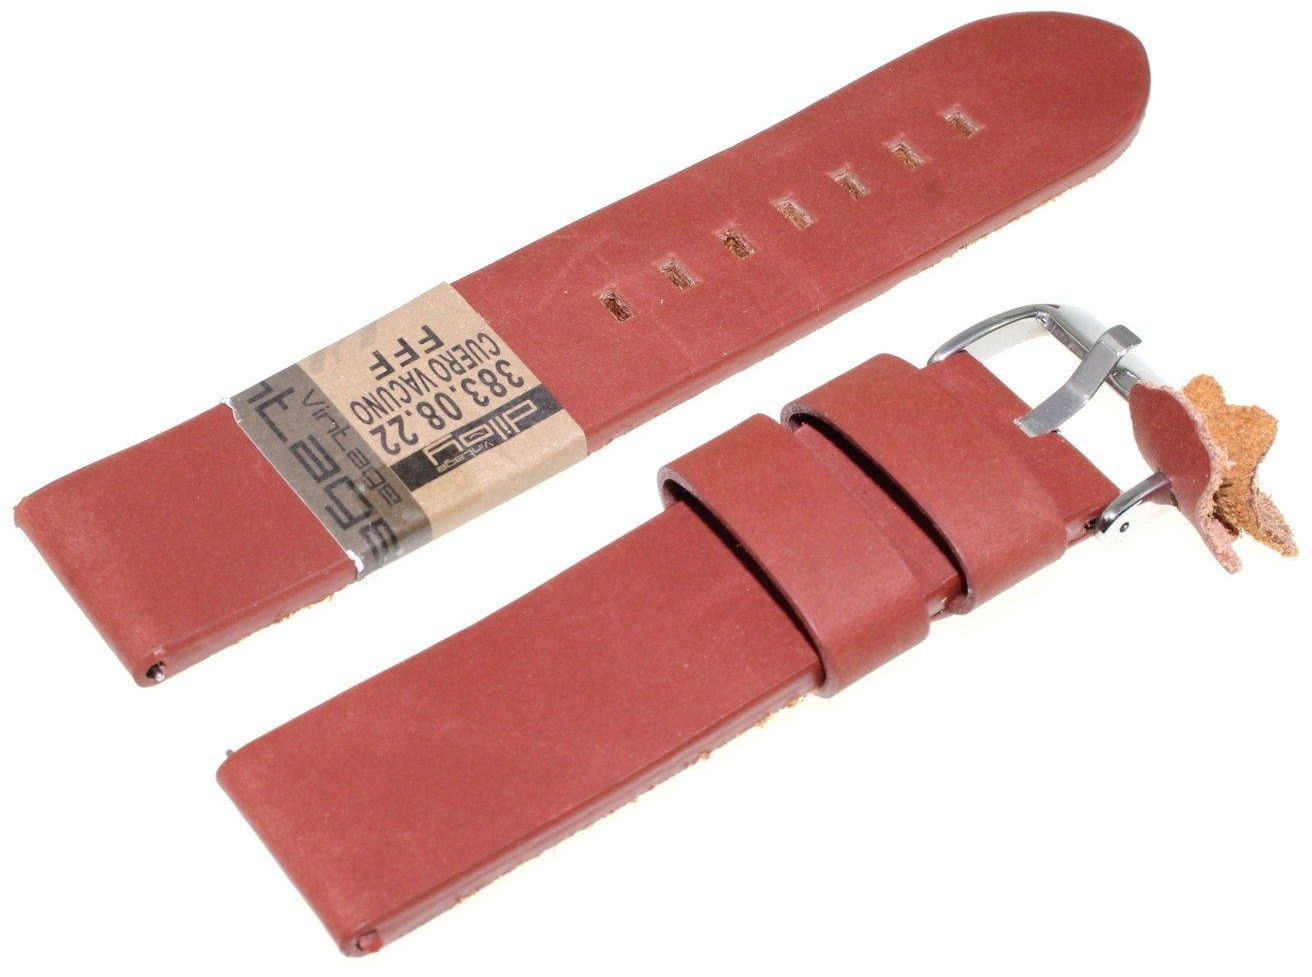 Skórzany pasek do zegarka 22 mm Diloy 383.22.8